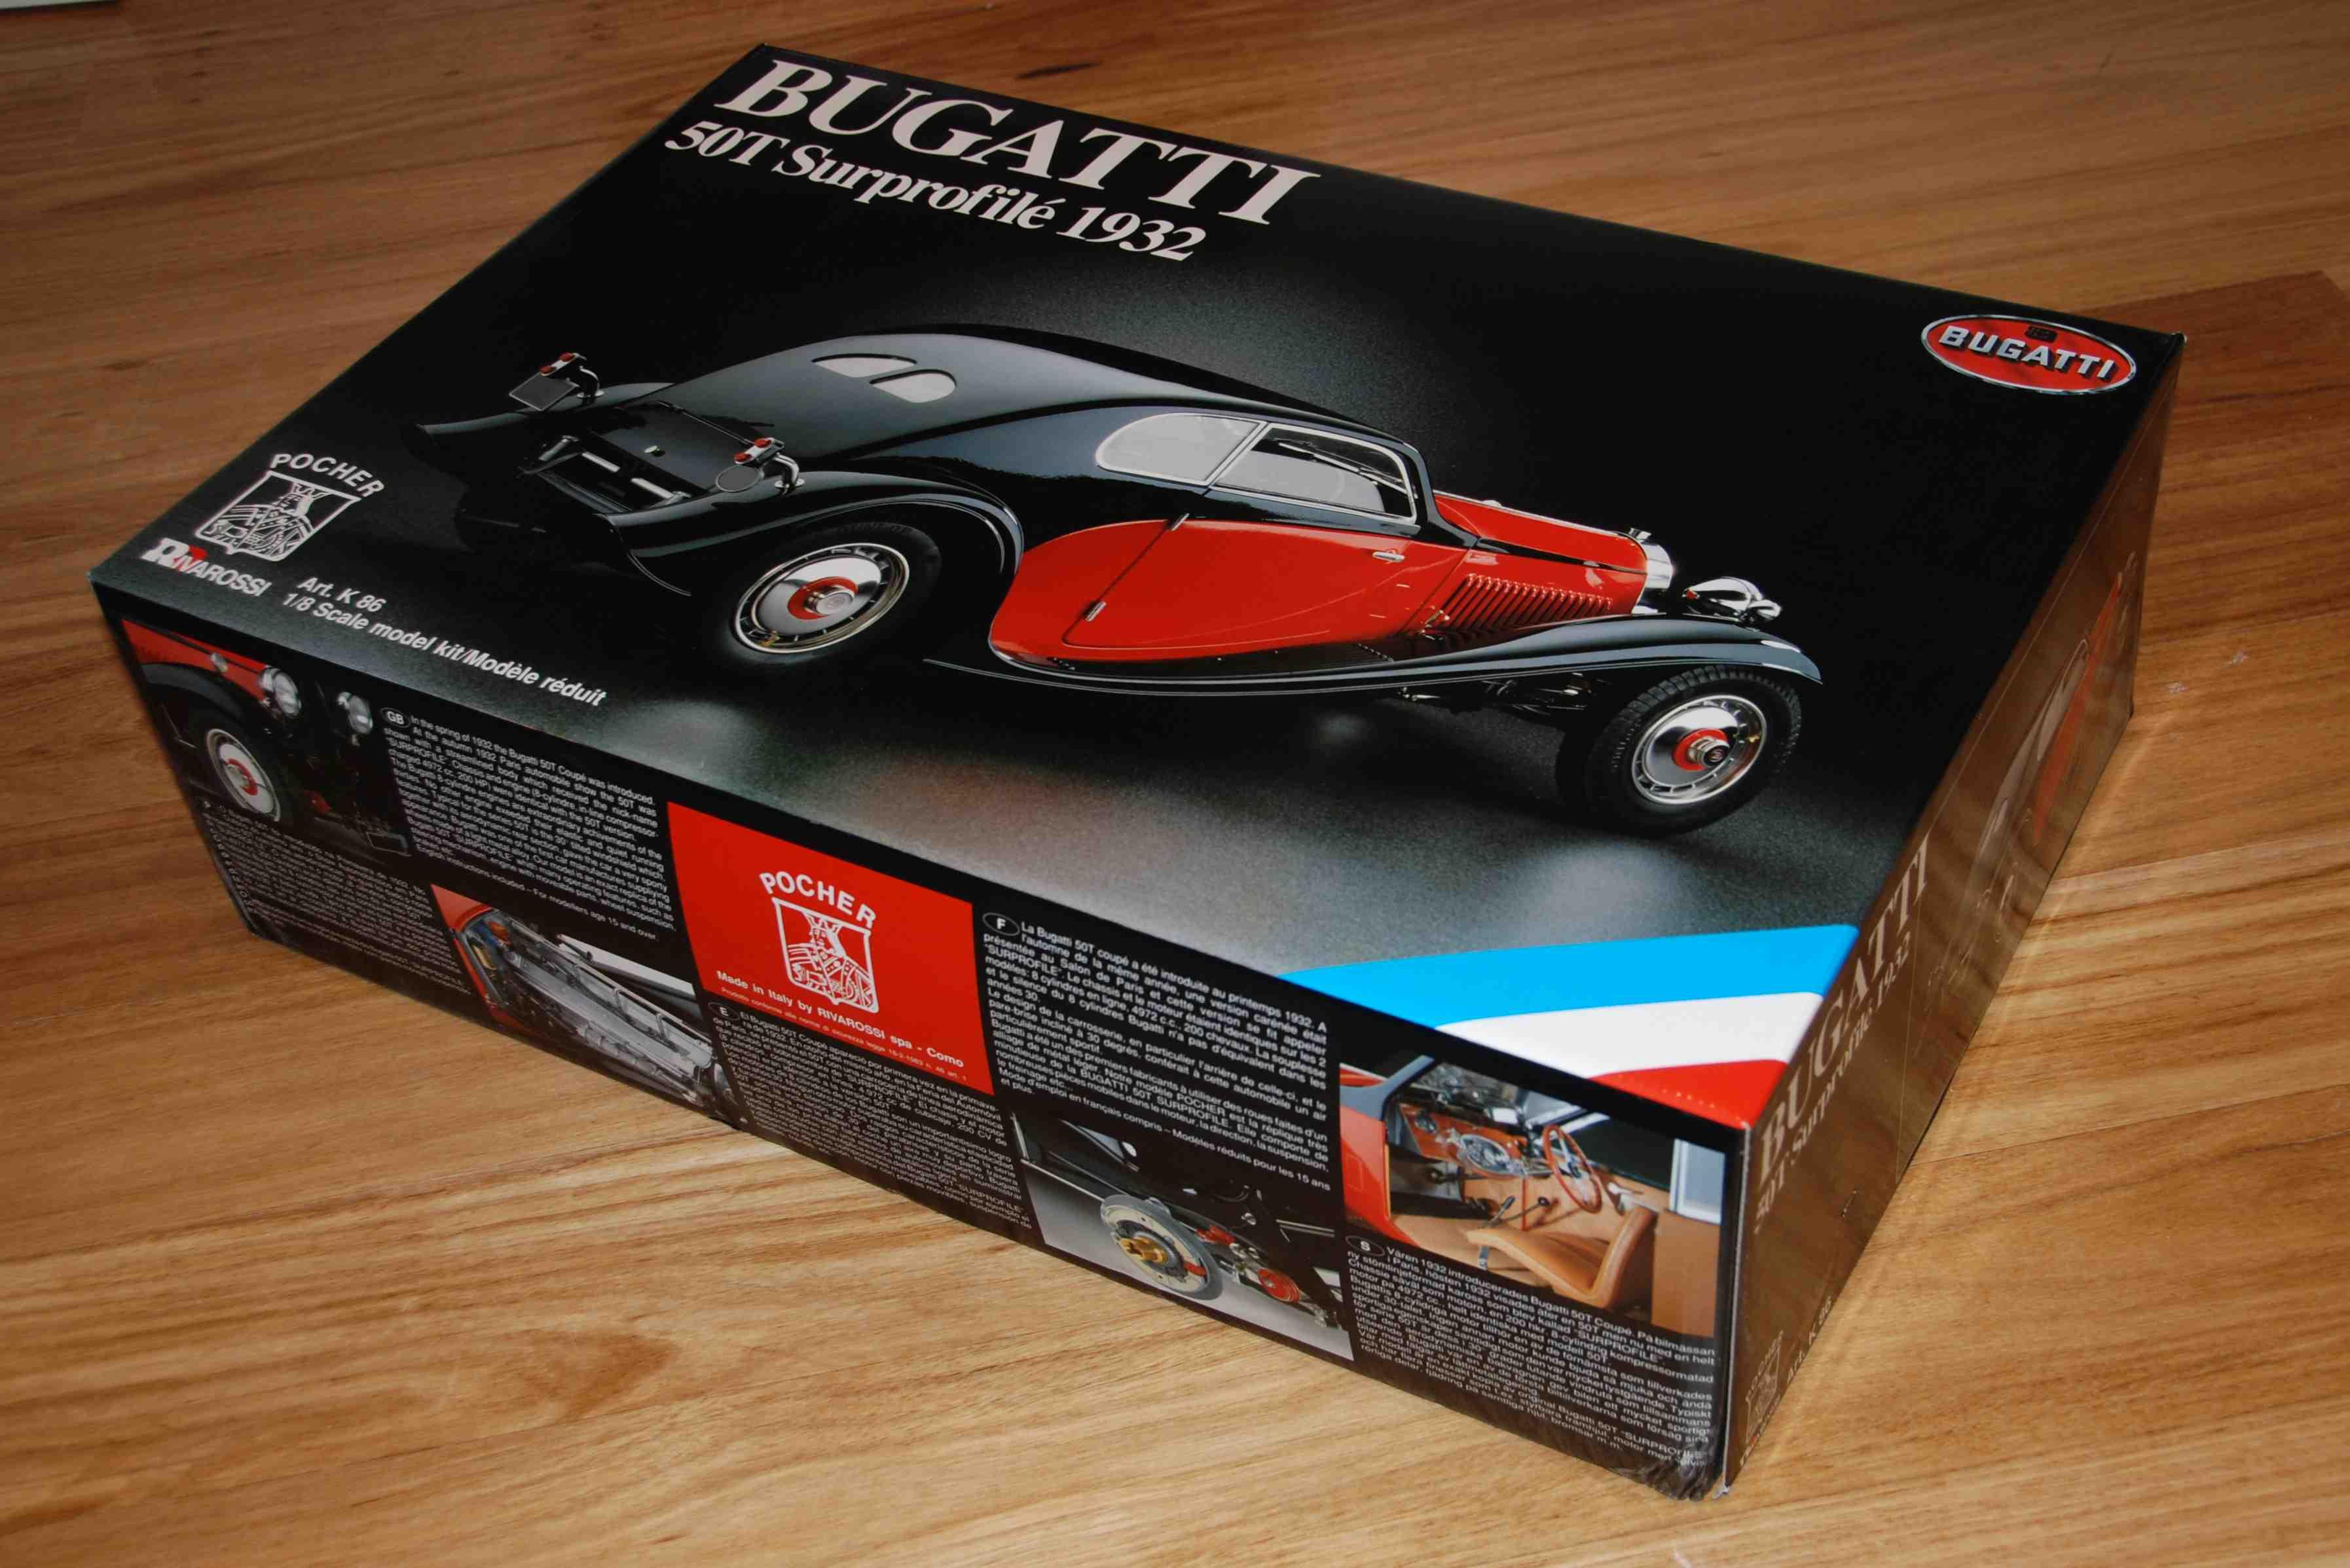 The Modeller U0026 39 S Workshop U00bb Pocher K86 1932 Bugatti 50T